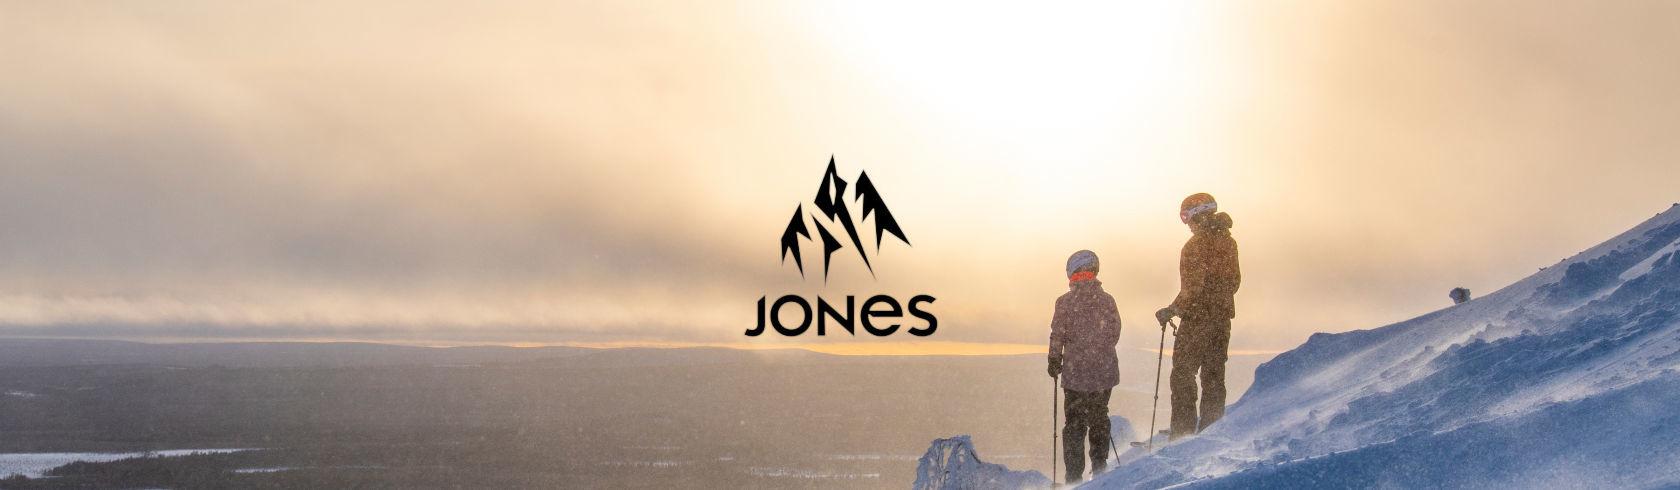 Jones Snowboards brand logo